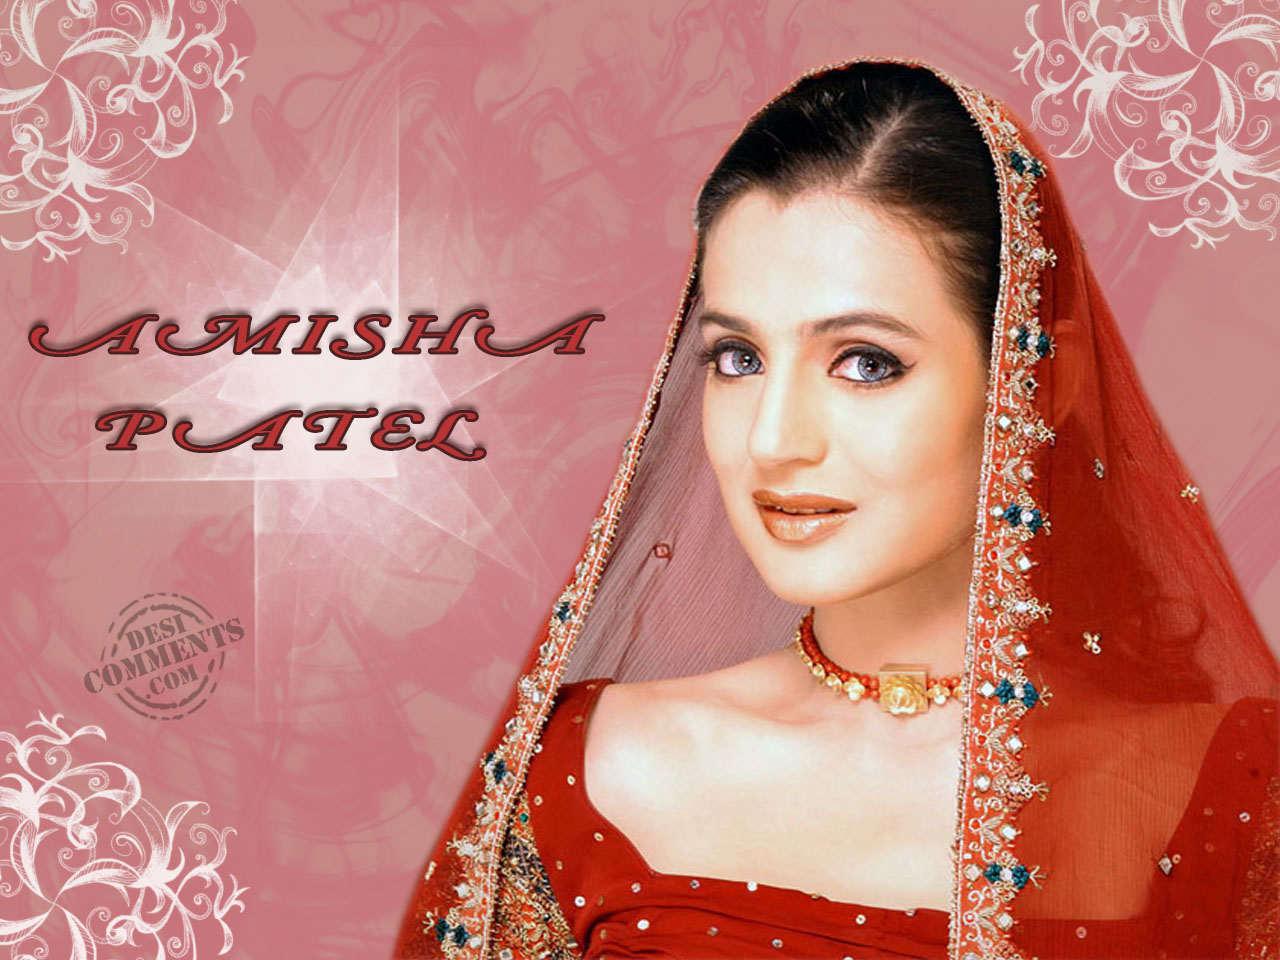 Amisha Patel Nangi Photo ameesha patel wallpapers, women, hq ameesha patel pictures